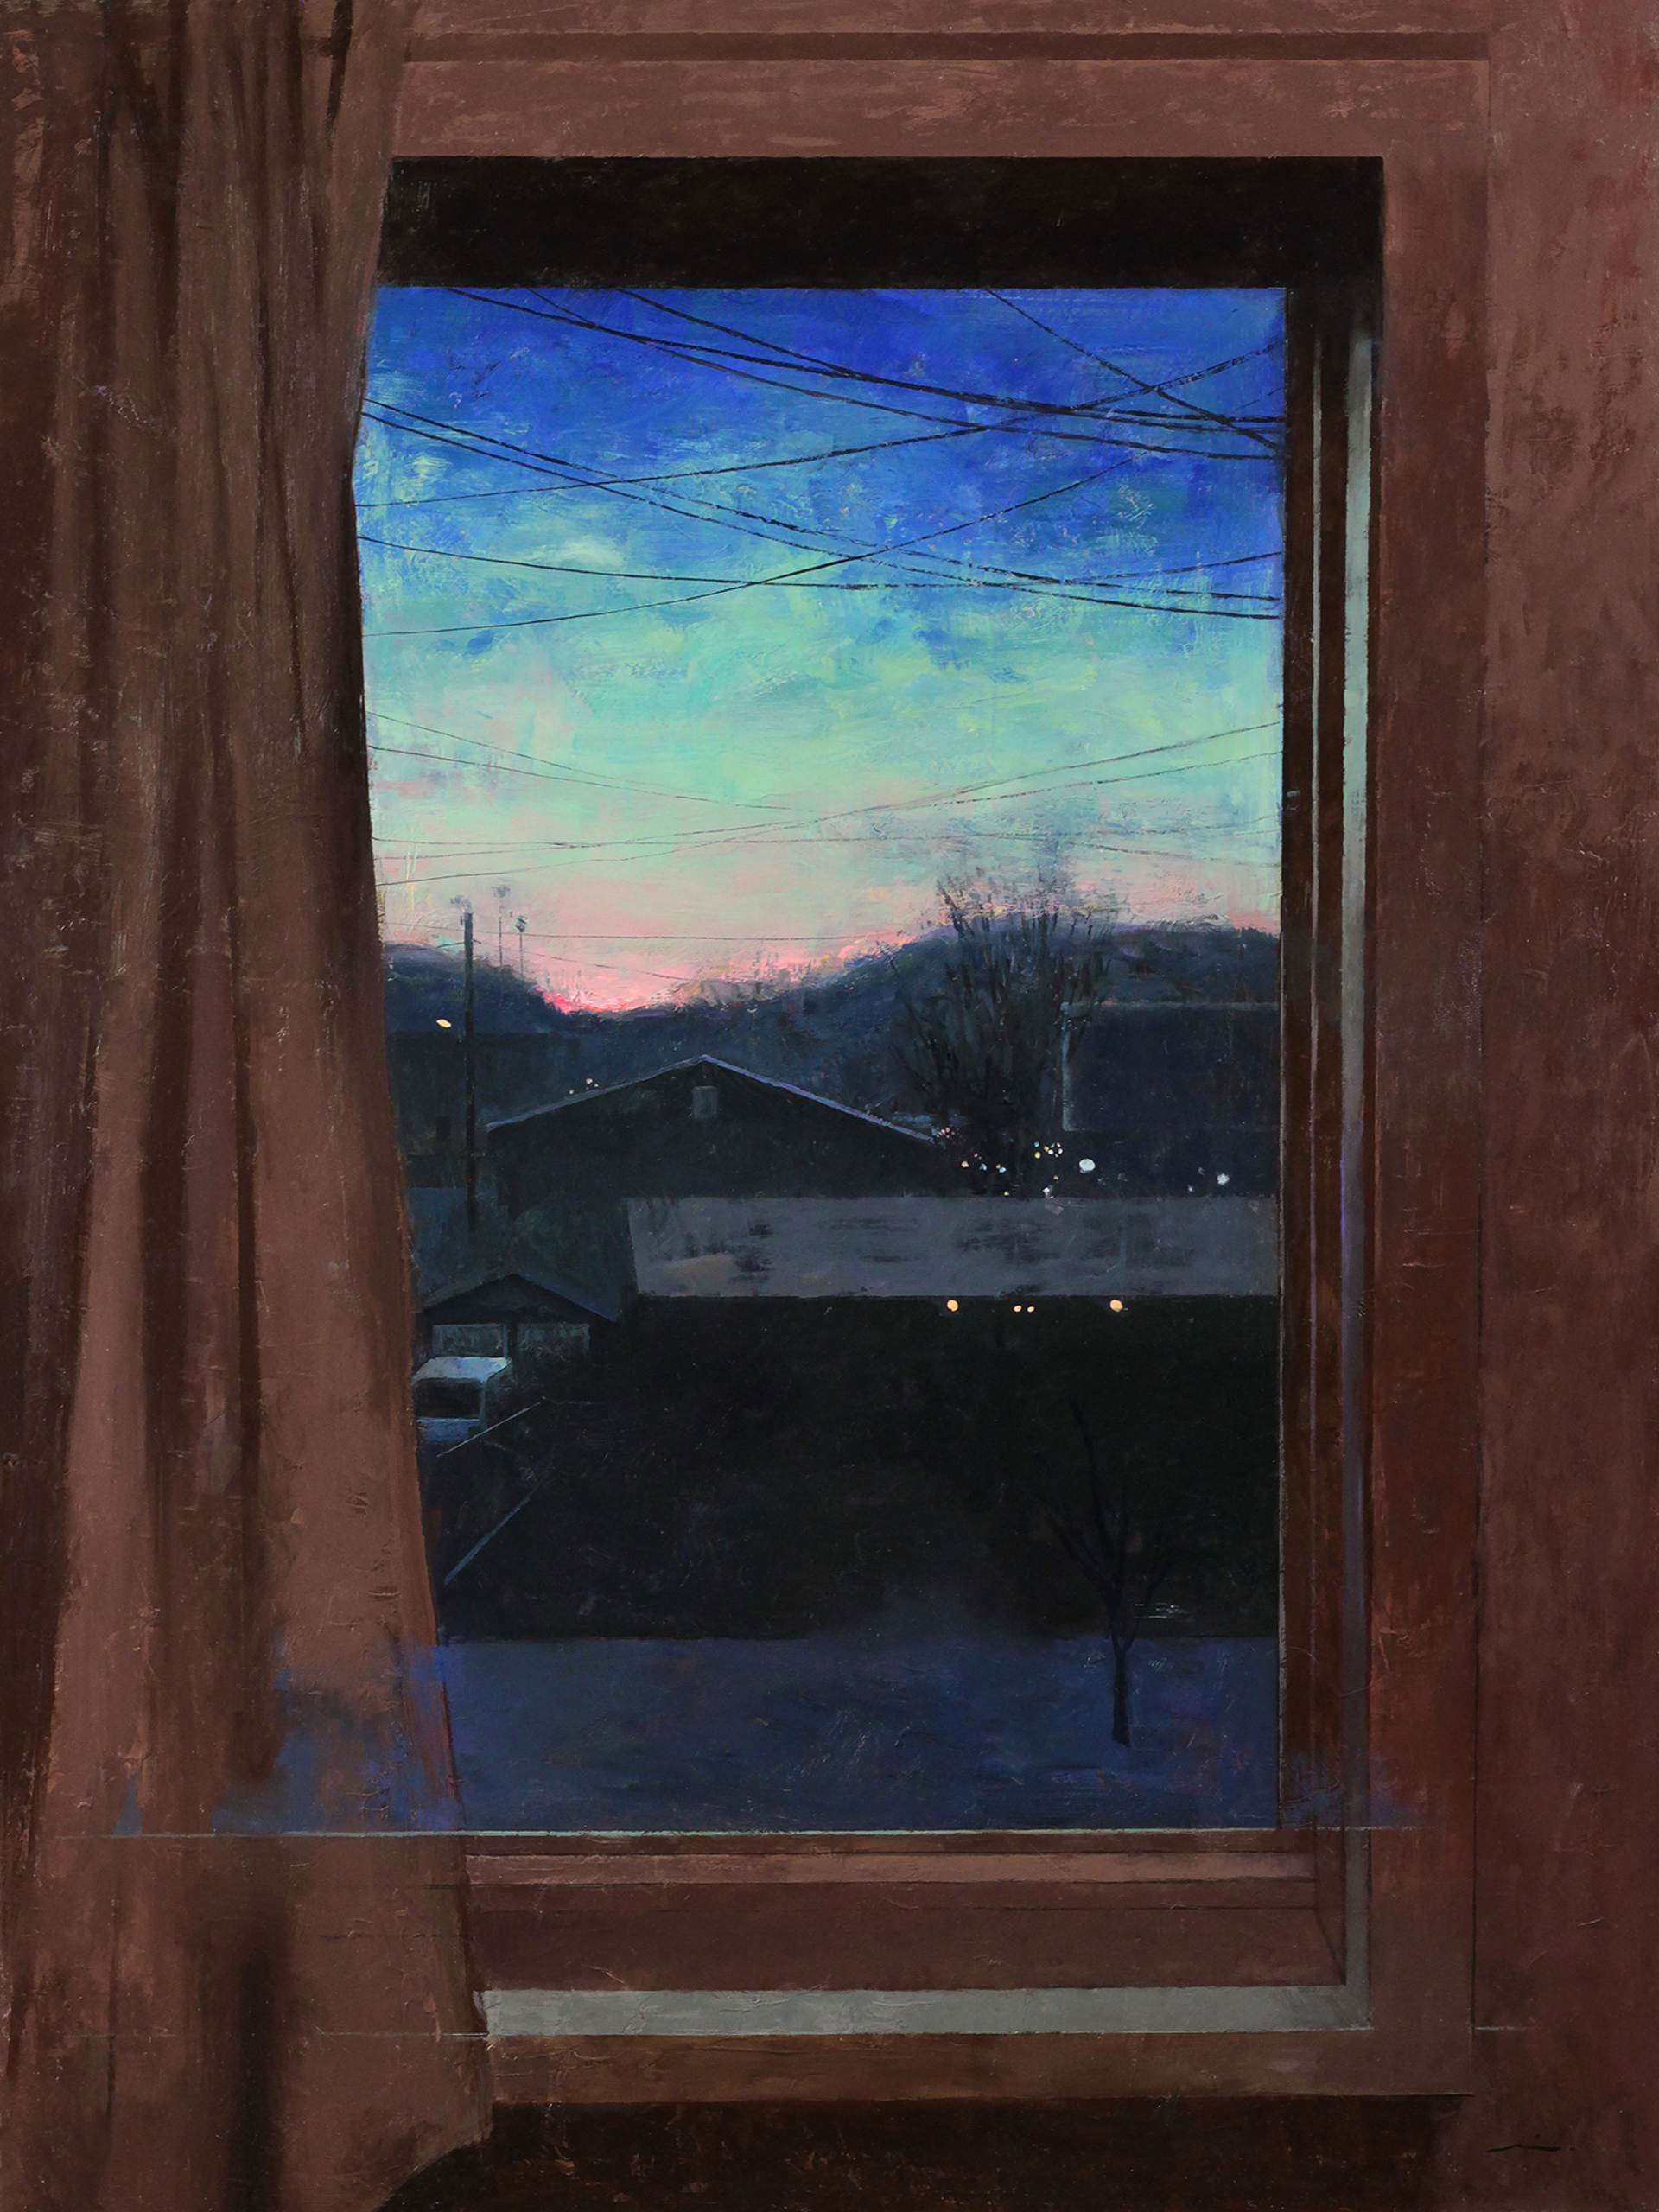 Studio View by Mia Bergeron